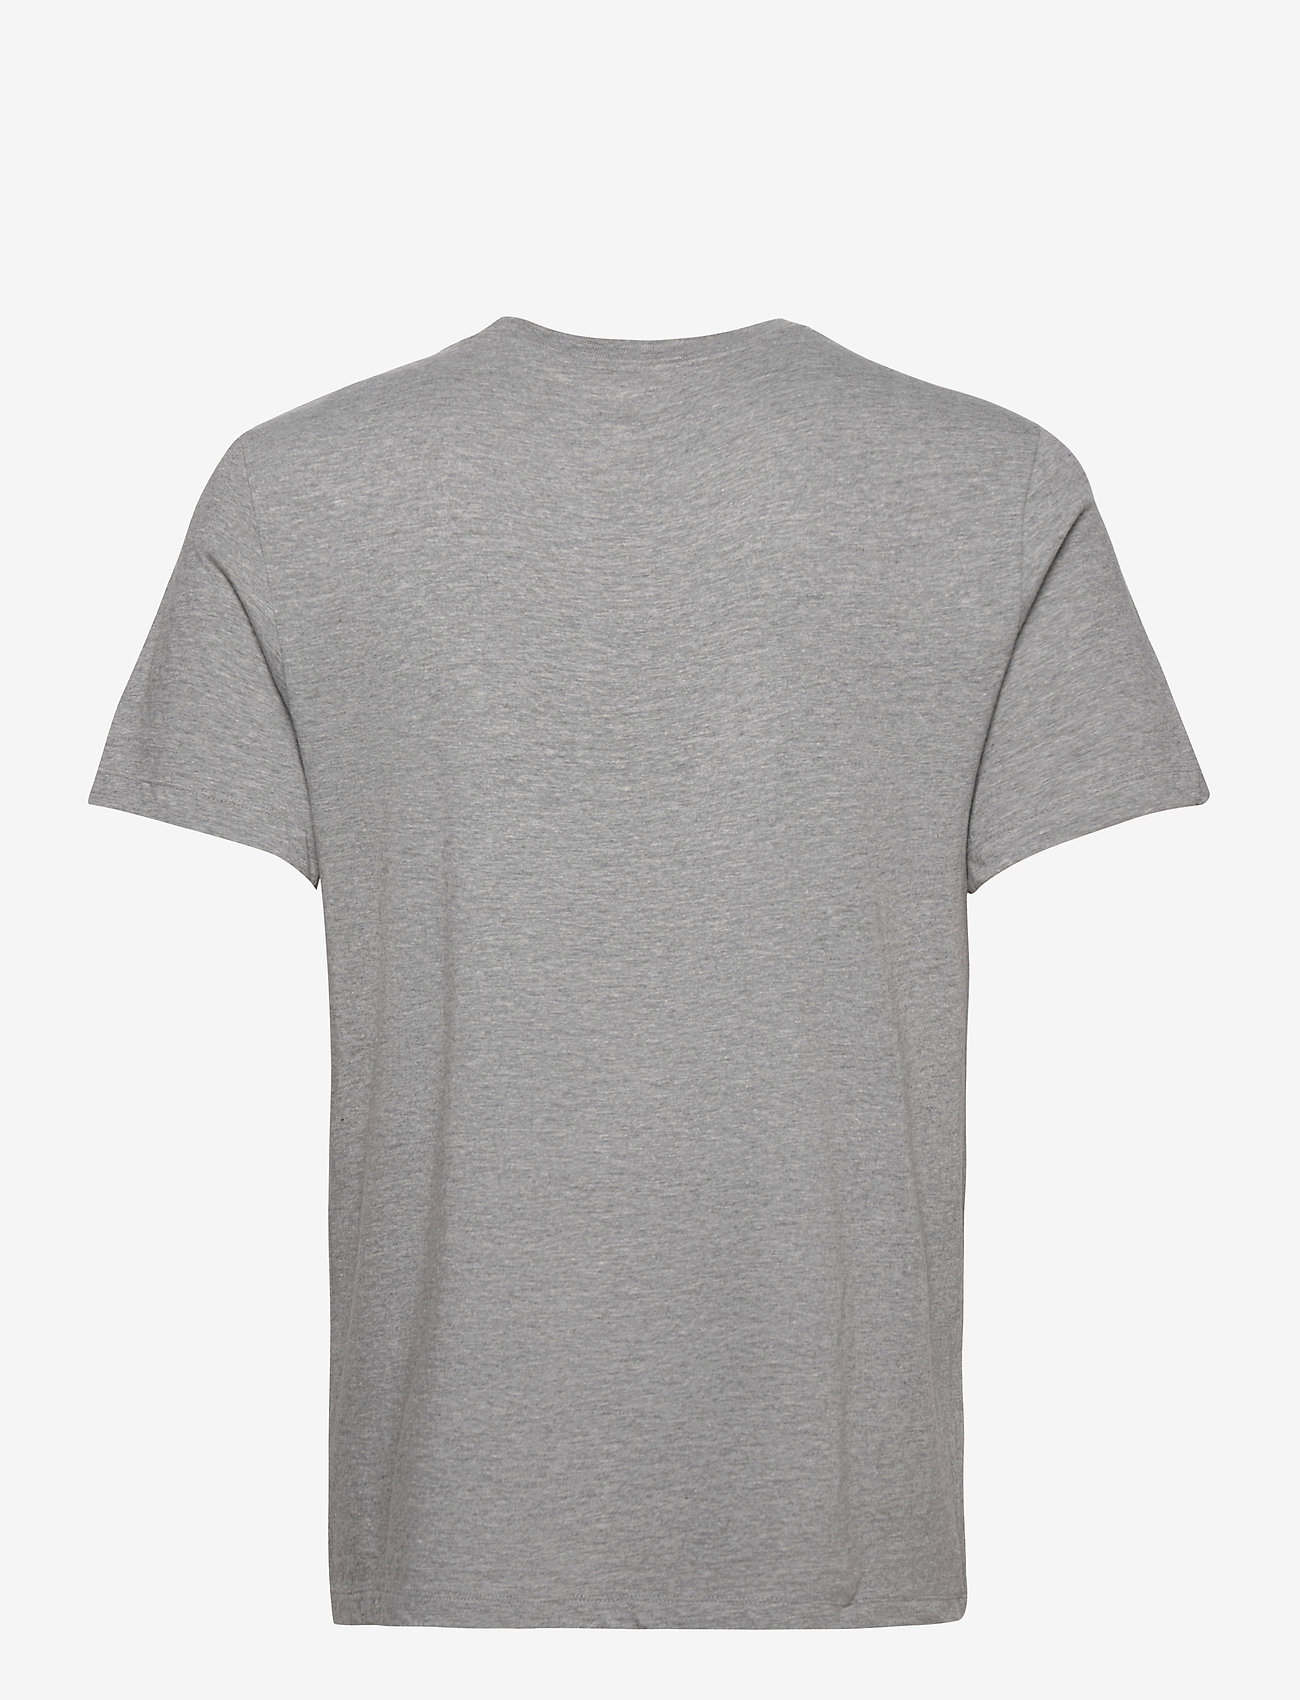 NIKE Fan Gear Oakland Athletics Nike Color Bar T-Shirt - T-skjorter DARK GREY HEATHER - Menn Klær